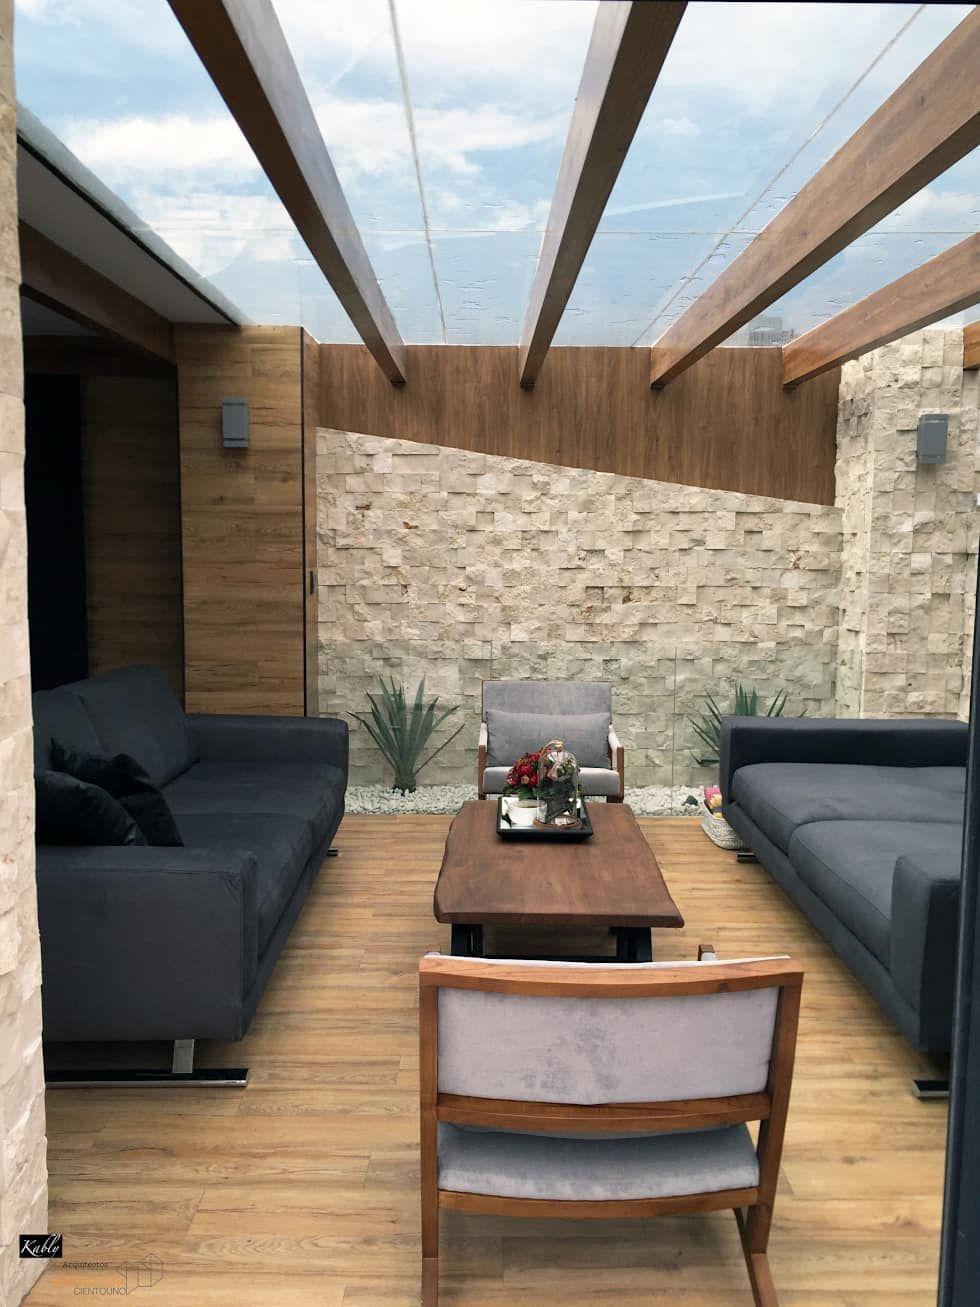 Terraza horacio terrazas de estilo por arquitectura101 for Patios y terrazas disenos